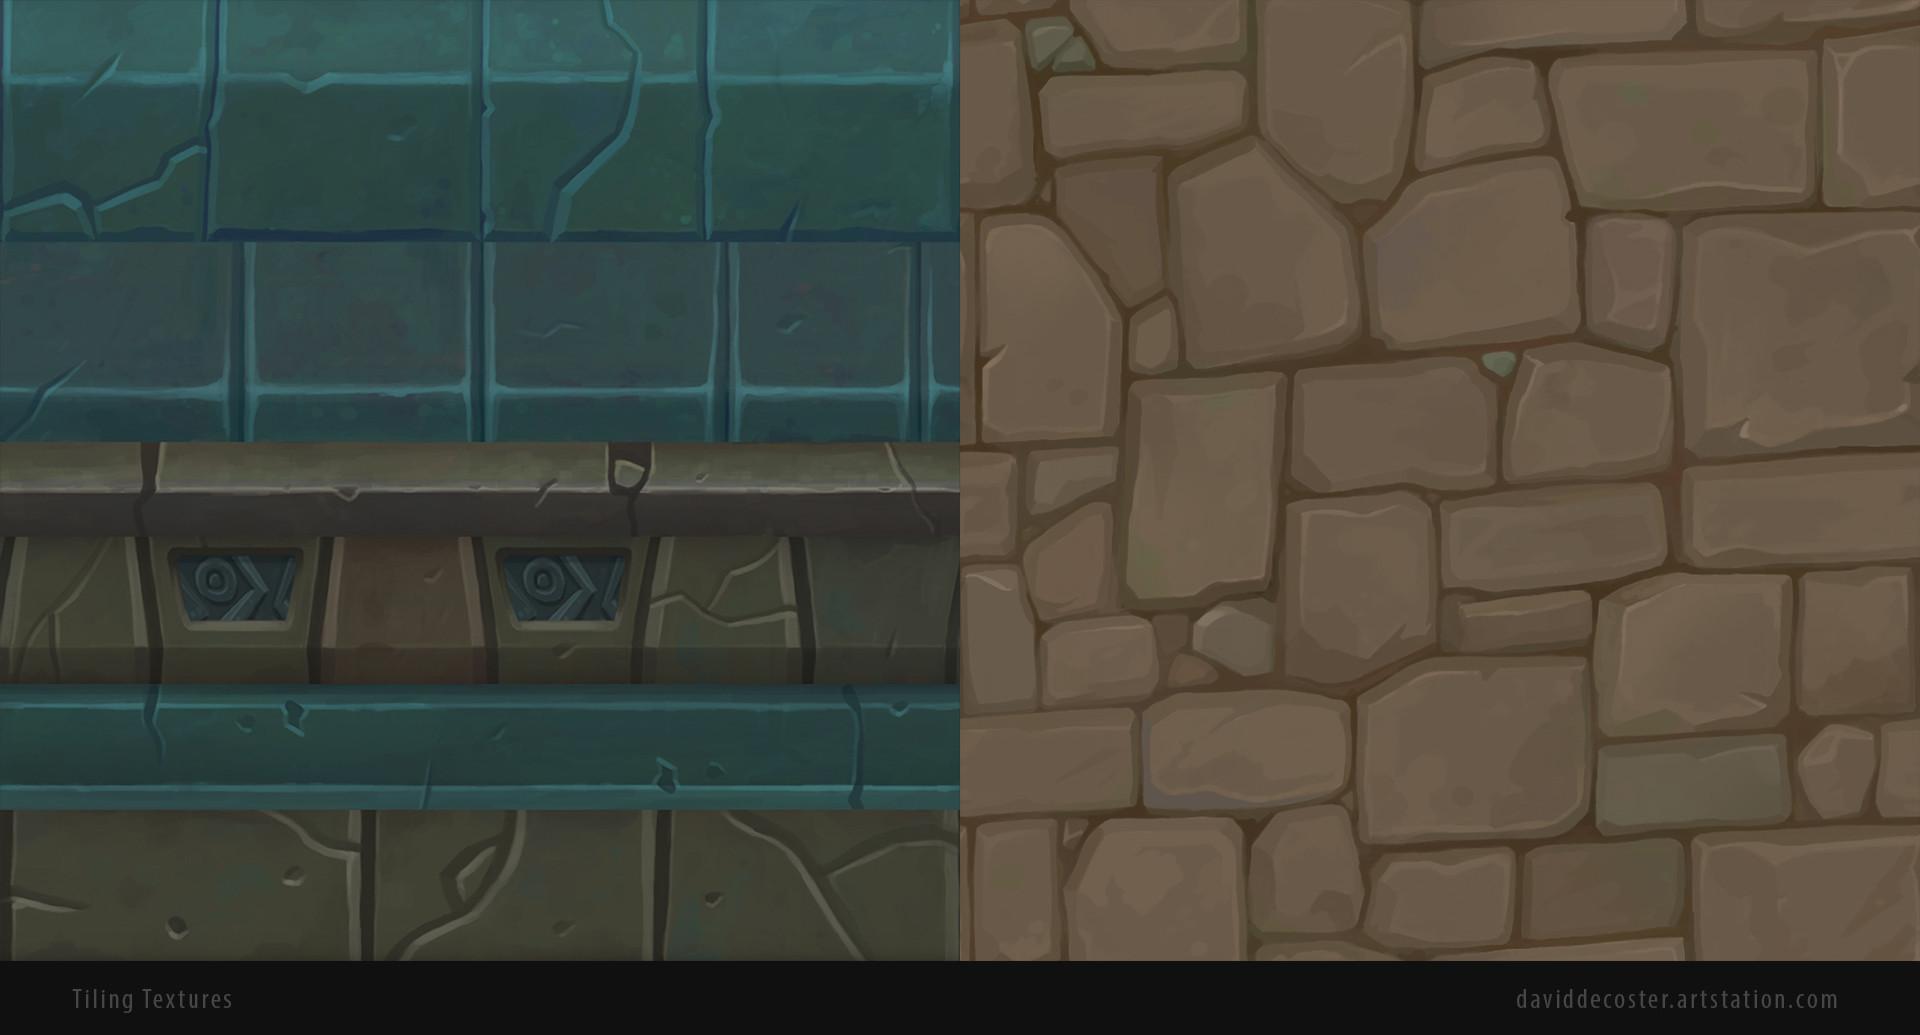 David decoster decoster tiling textures 03